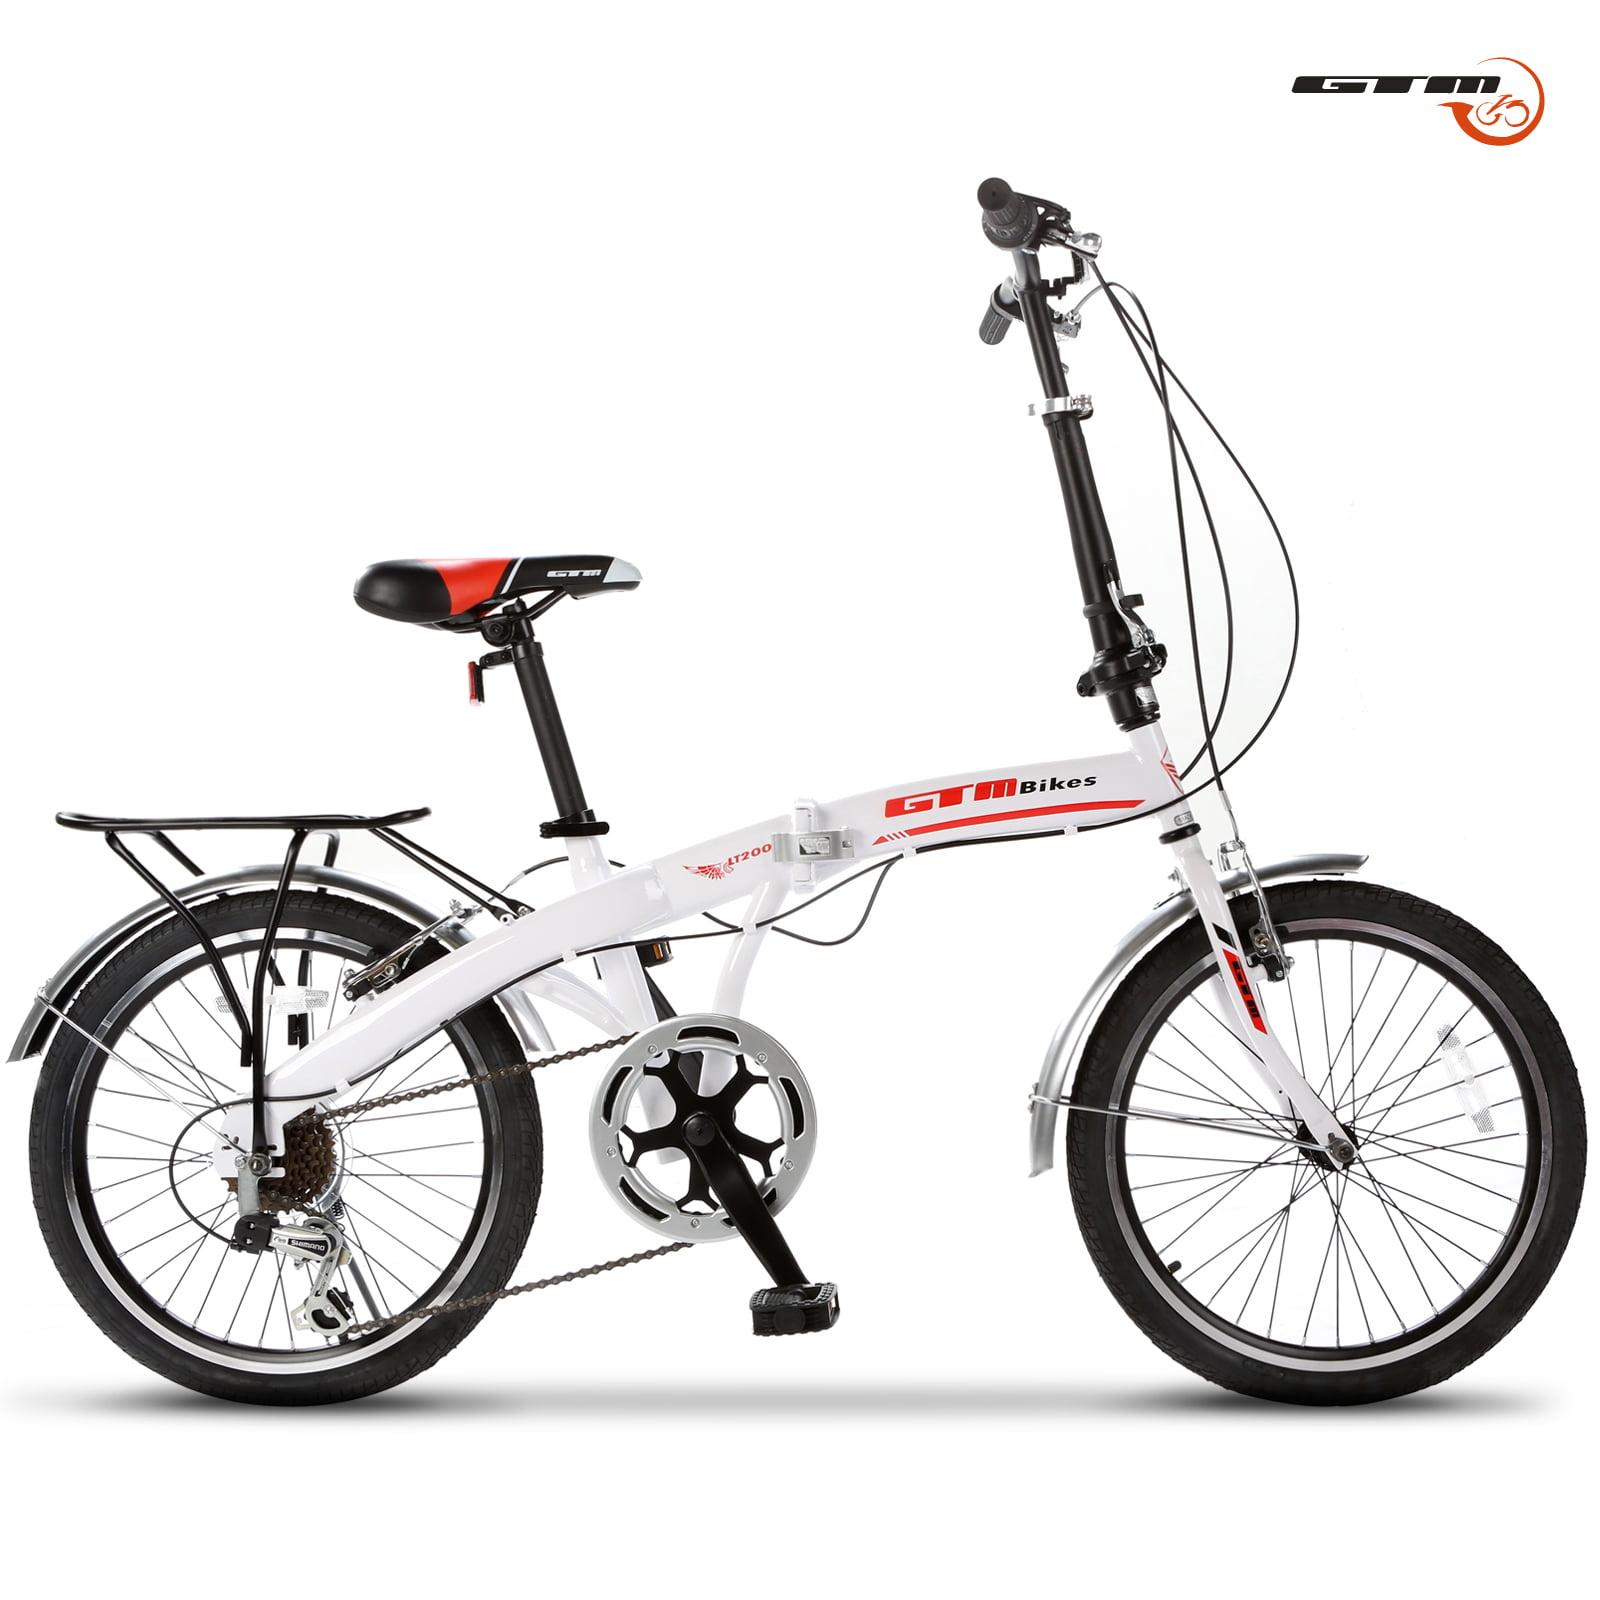 "Uenjoy 20"" Folding Bike Foldable Mountain Bike Shimano 6 Speed Bicycle,White by Uenjoy"